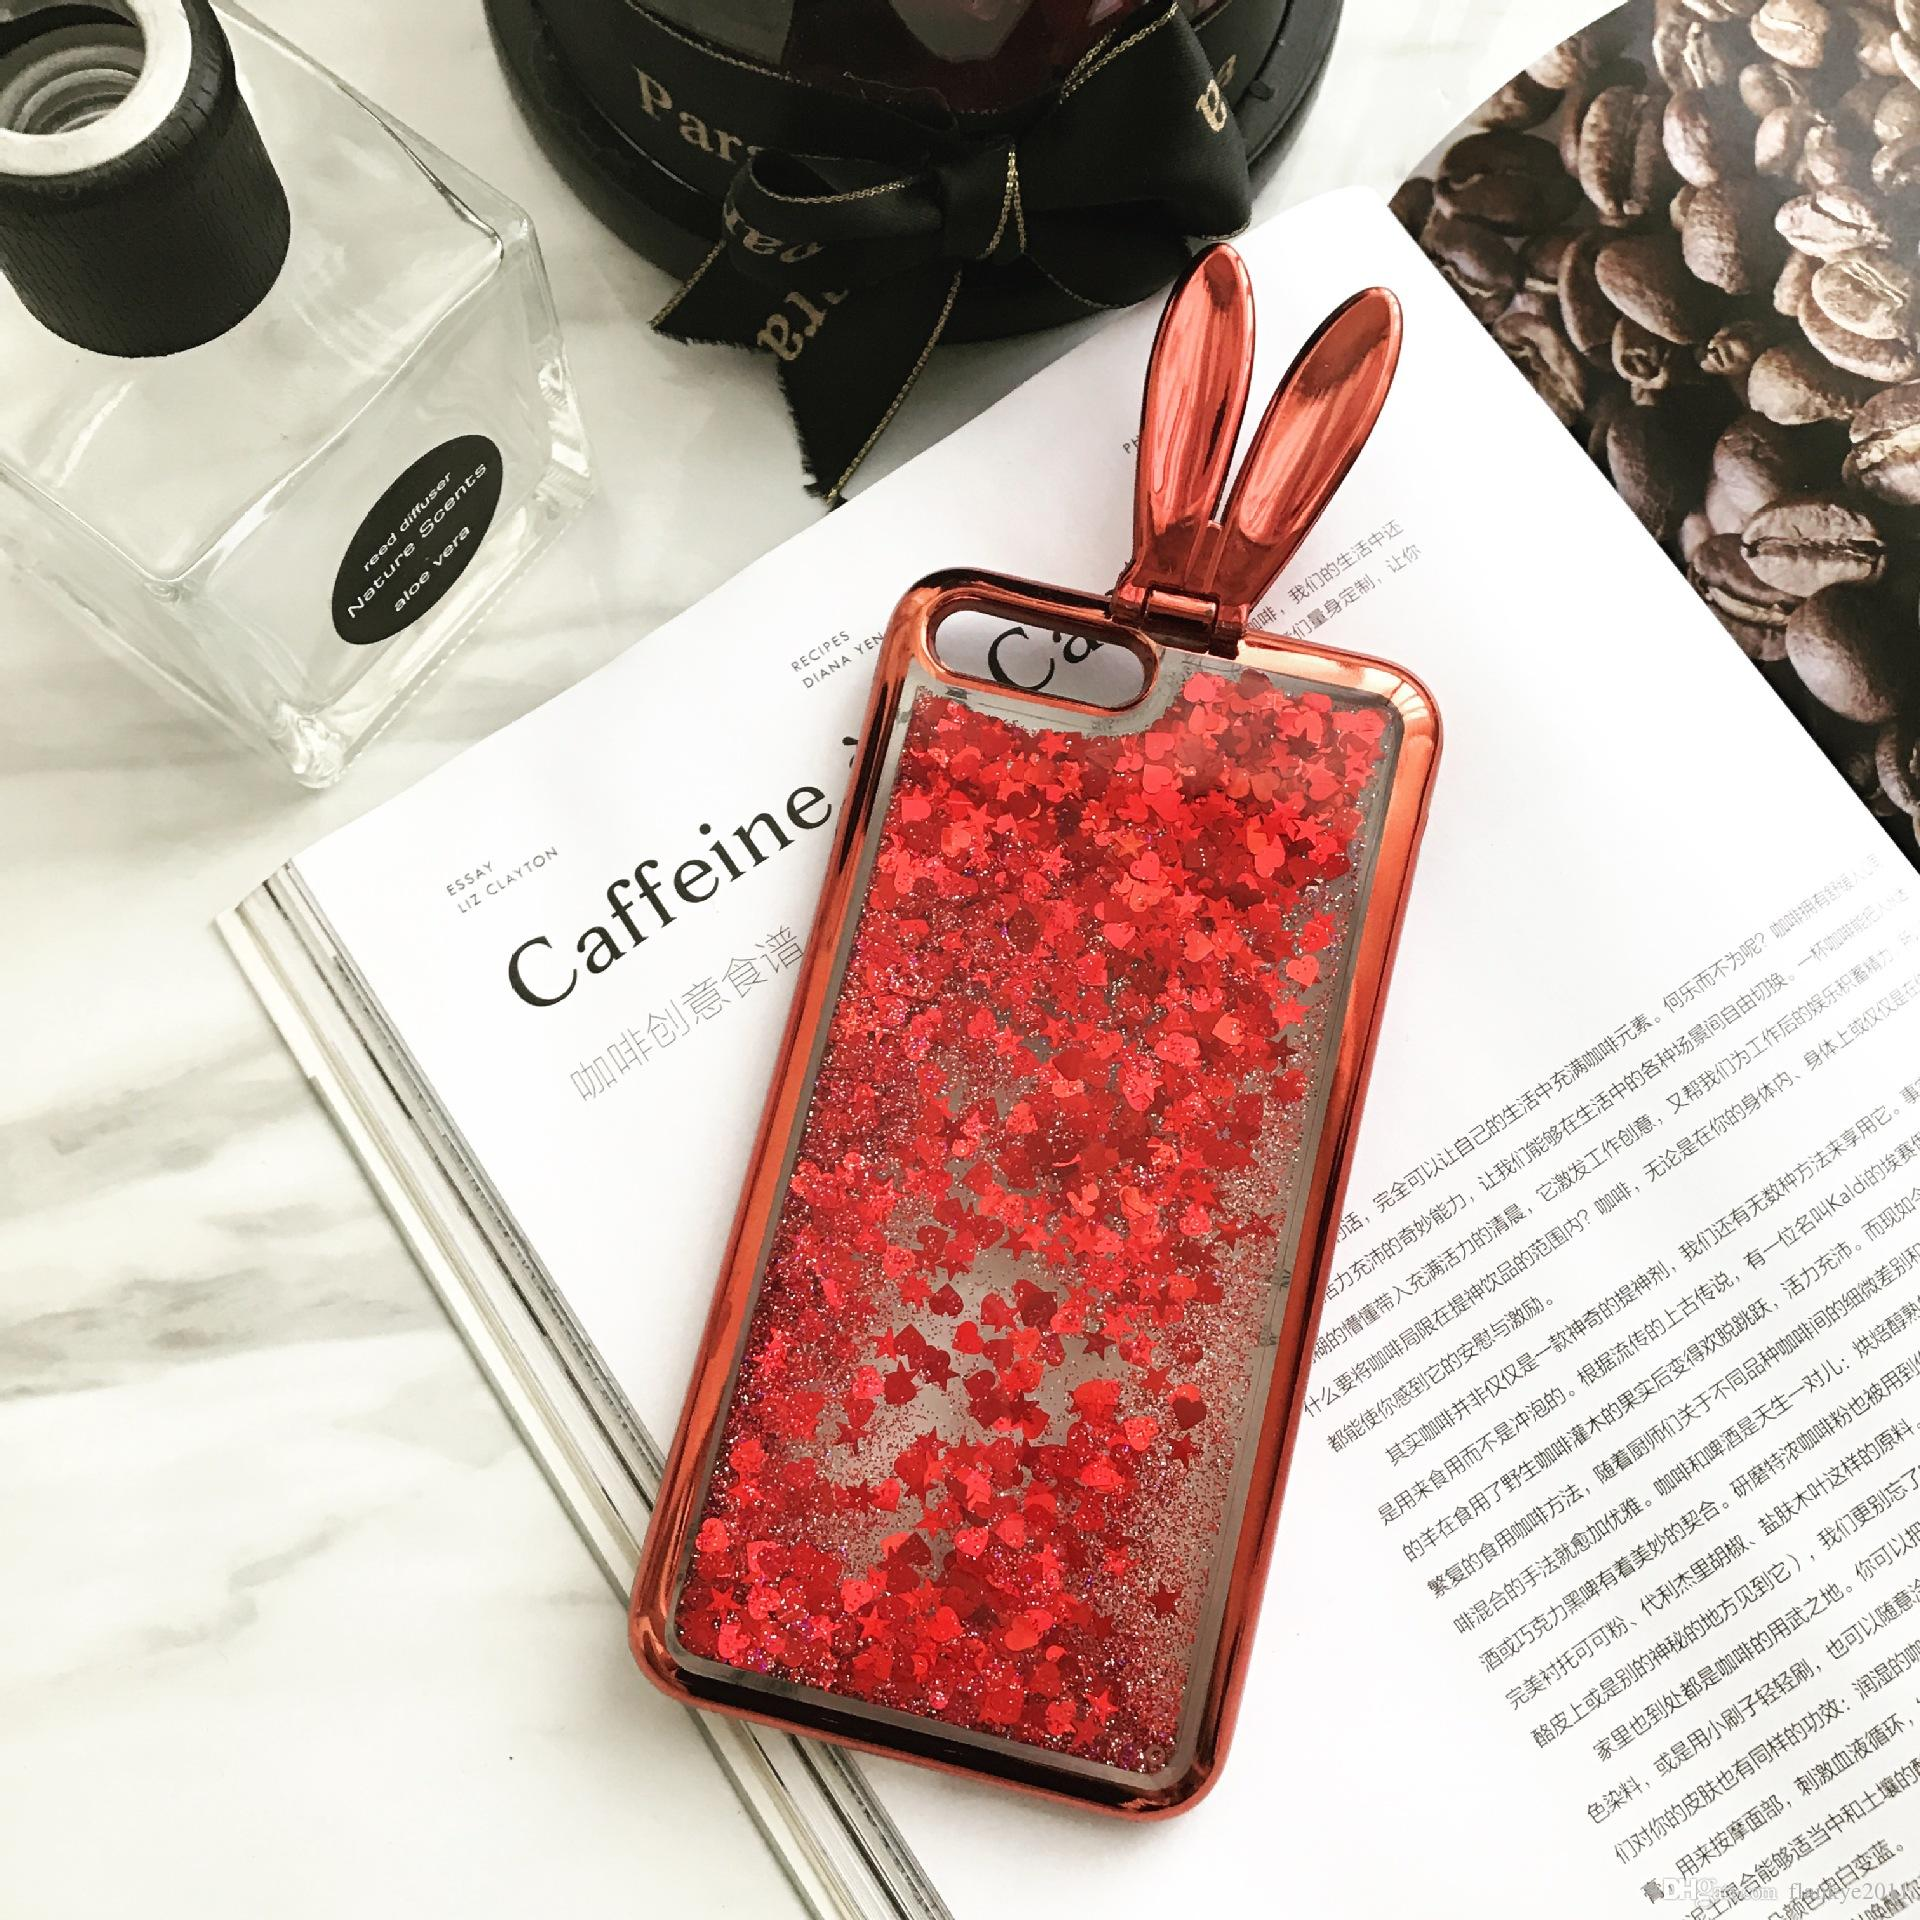 Love Heart Stars Glitter Stars Phone Case For IPhone 6 6S 7 7 Plus Dynamic Liquid Quicksand Soft TPU Back Cover Phone Case Phone Case for Iphone 7 Tpu Cover